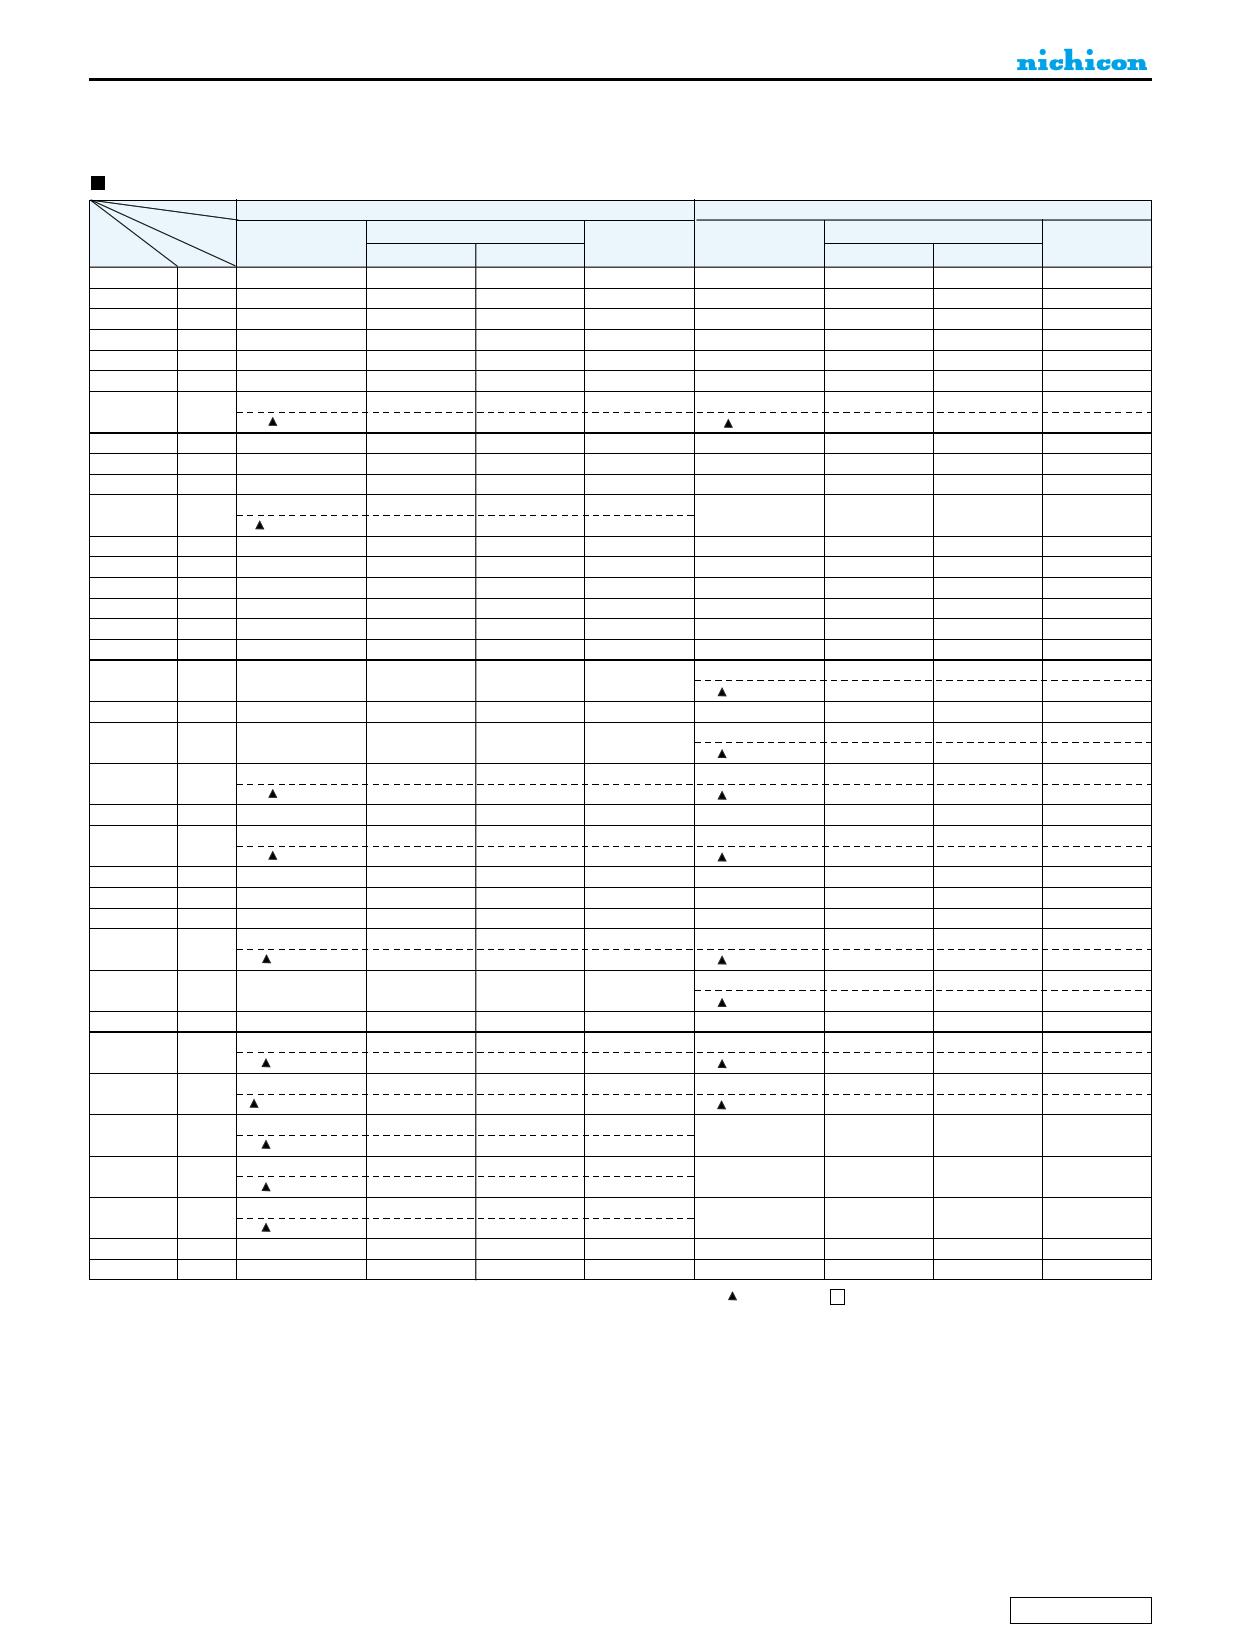 UPW1H330MED pdf, 반도체, 판매, 대치품